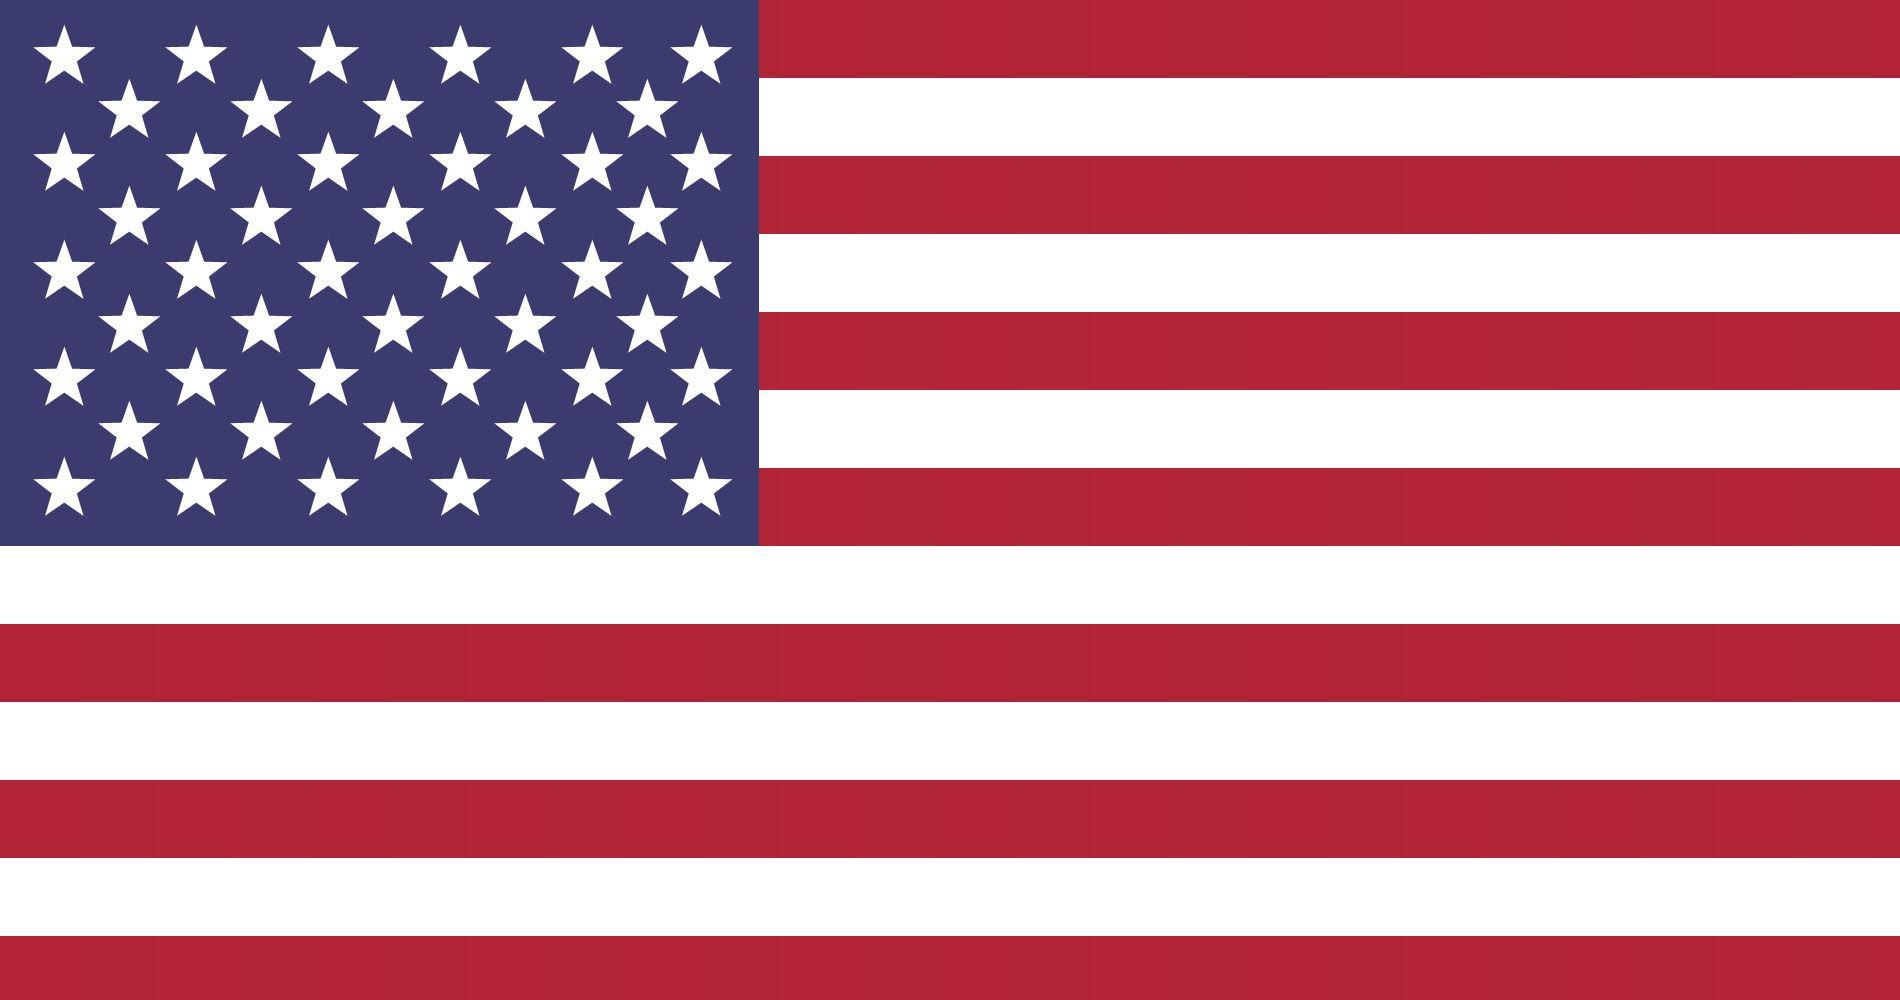 United States Flag Flags Of The World United States Flag Flag